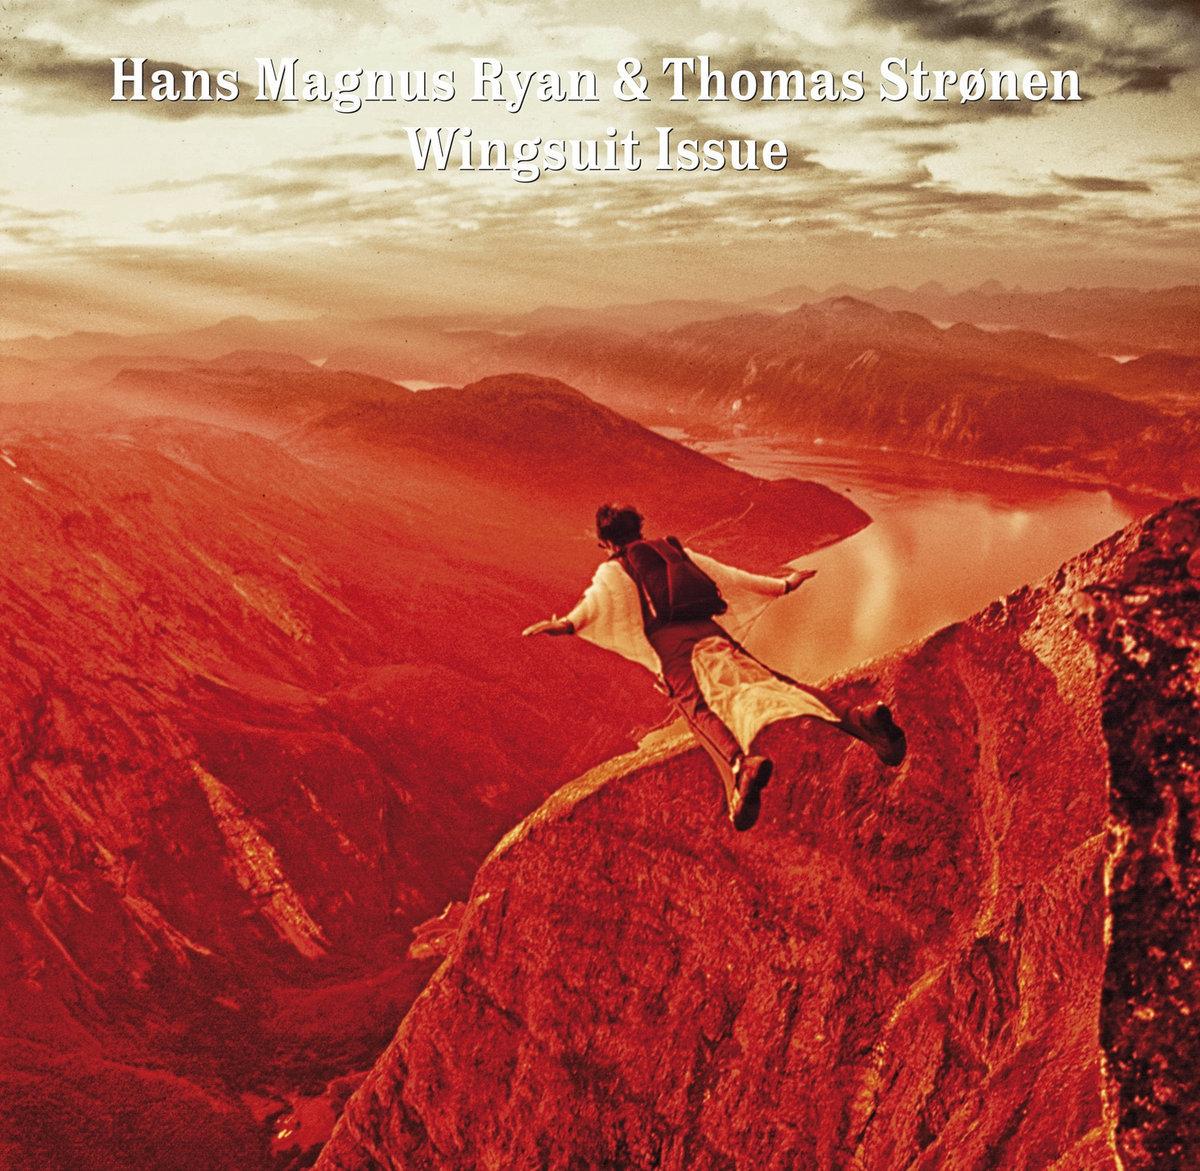 Hans Magnus Ryan & Thomas Strønen - Wingsuit Issue [LP] (Red vinyl)